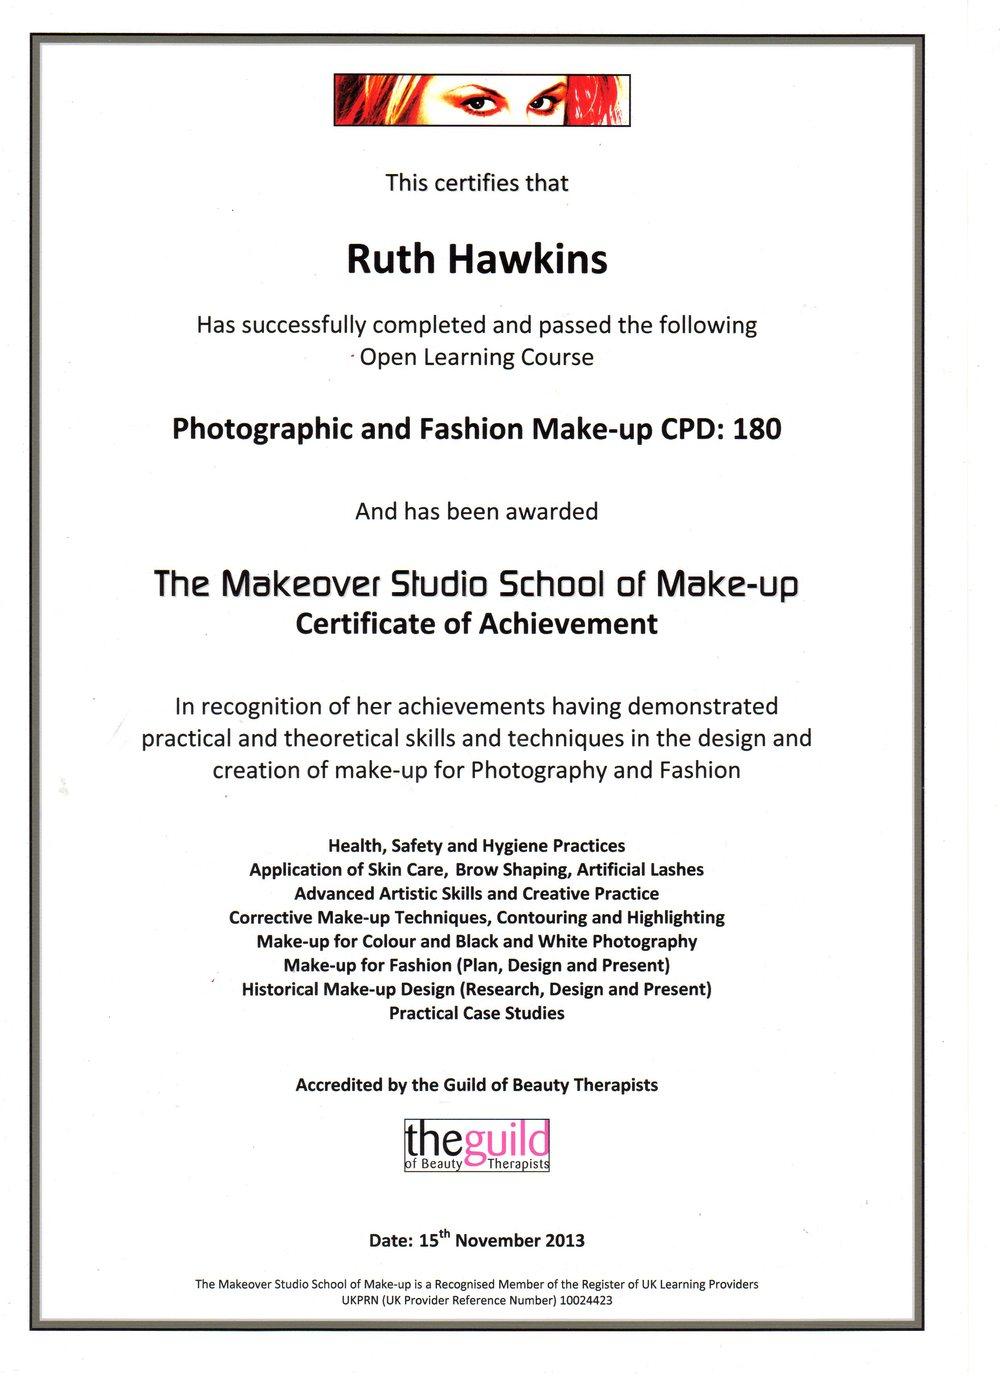 fashion certificate.jpg